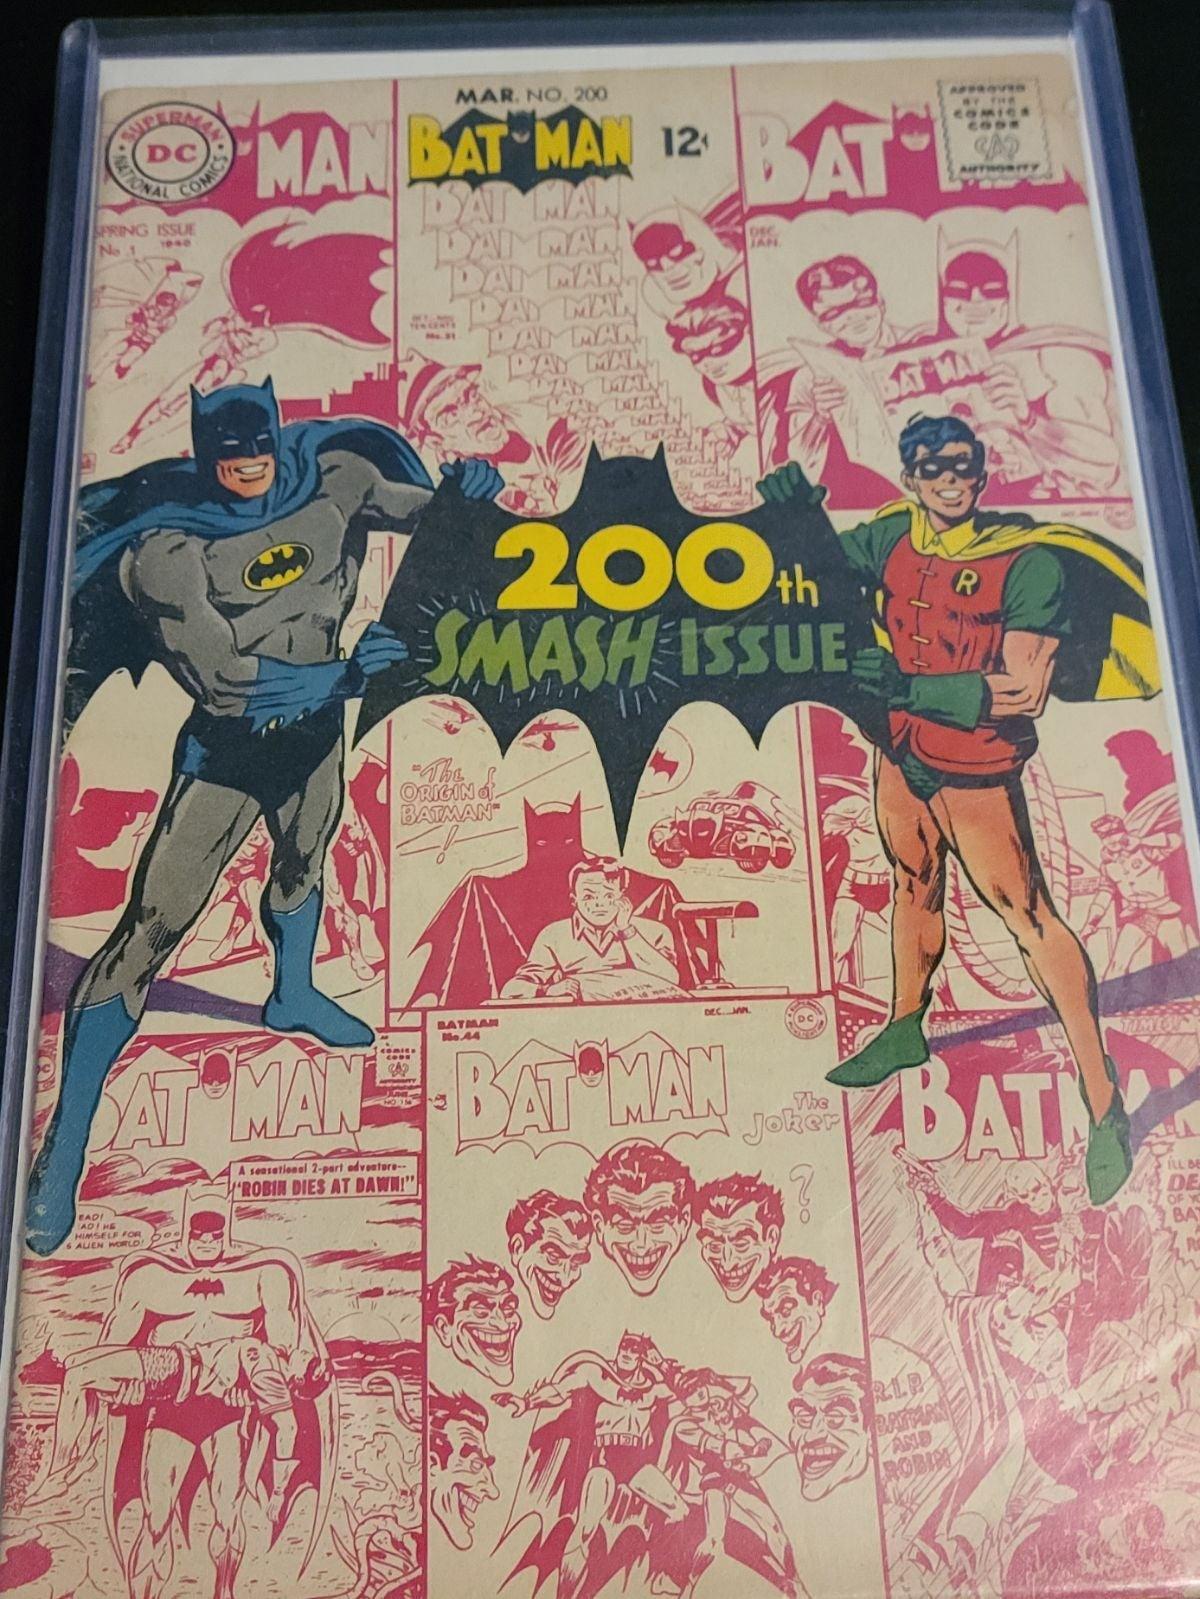 Batman issue #200 SMASH! Edition